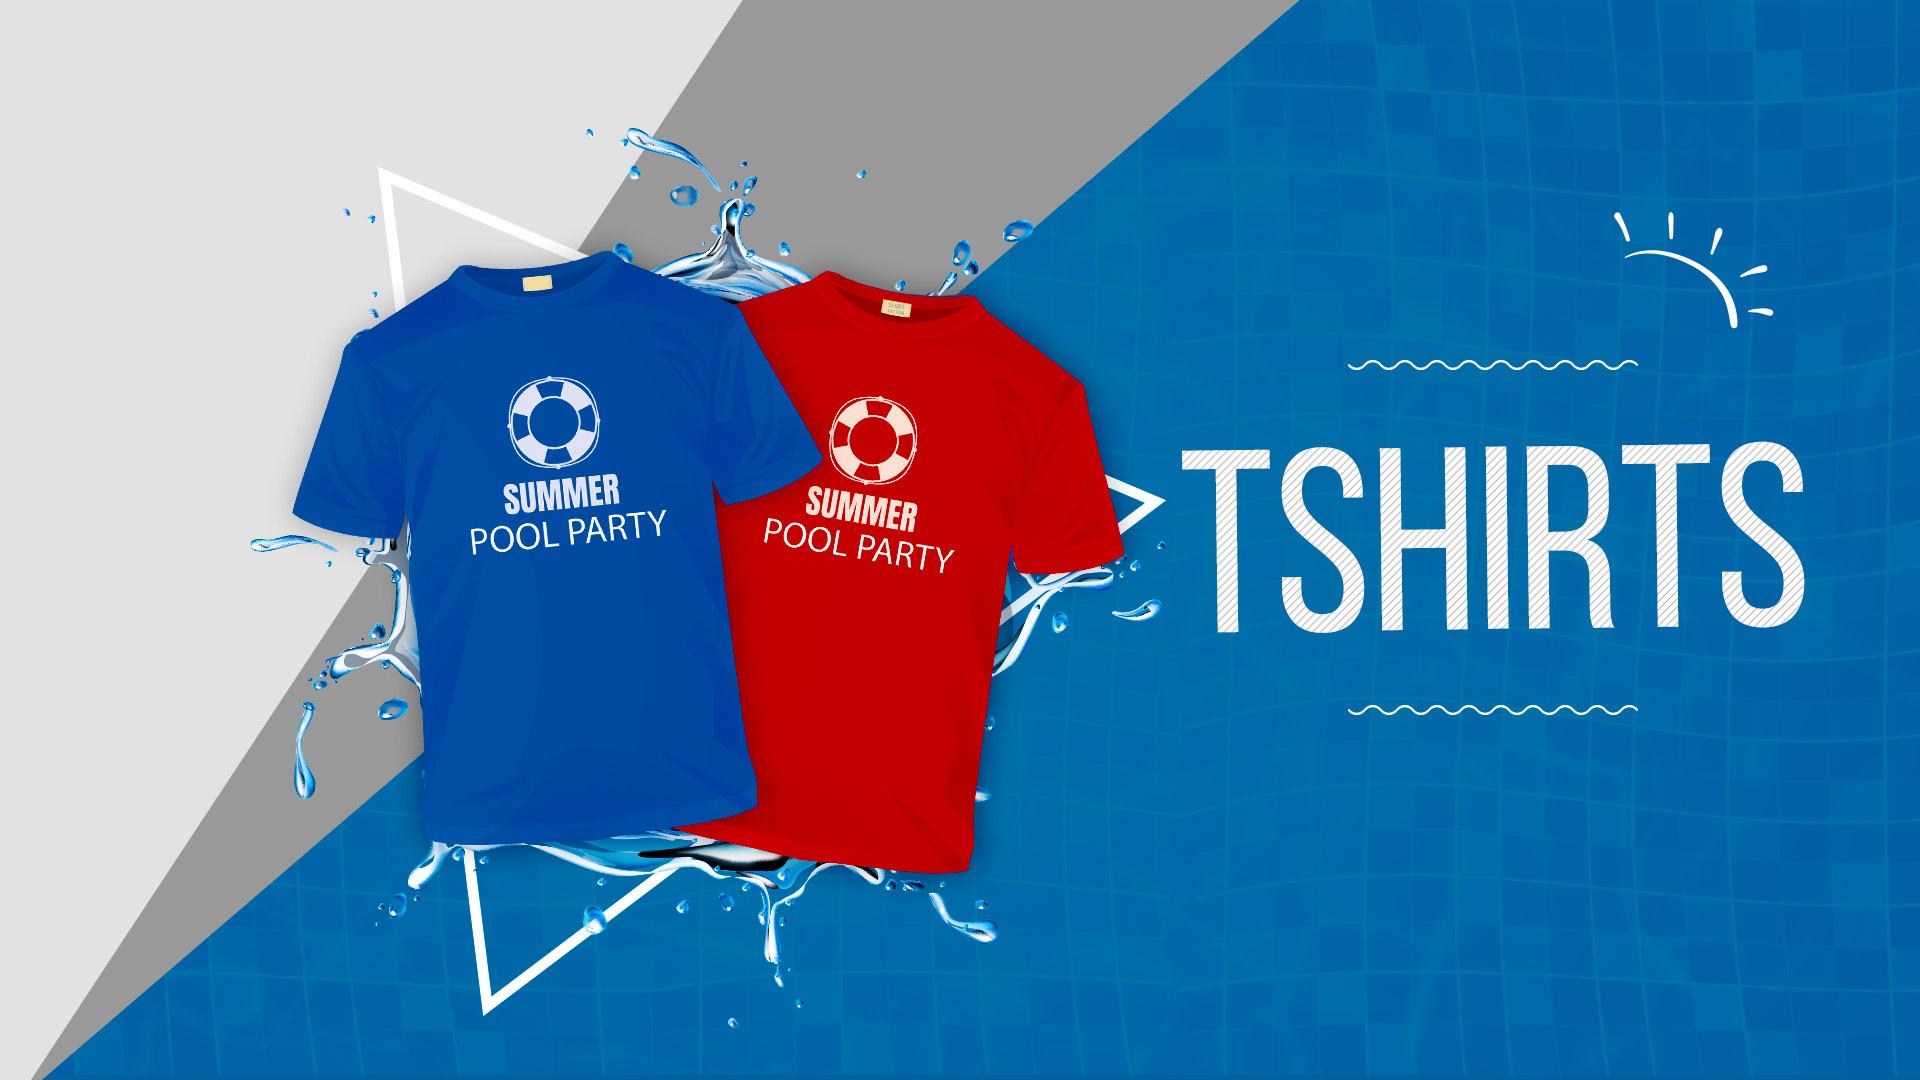 Pool_Party TShirts - 24HourWristbands.com